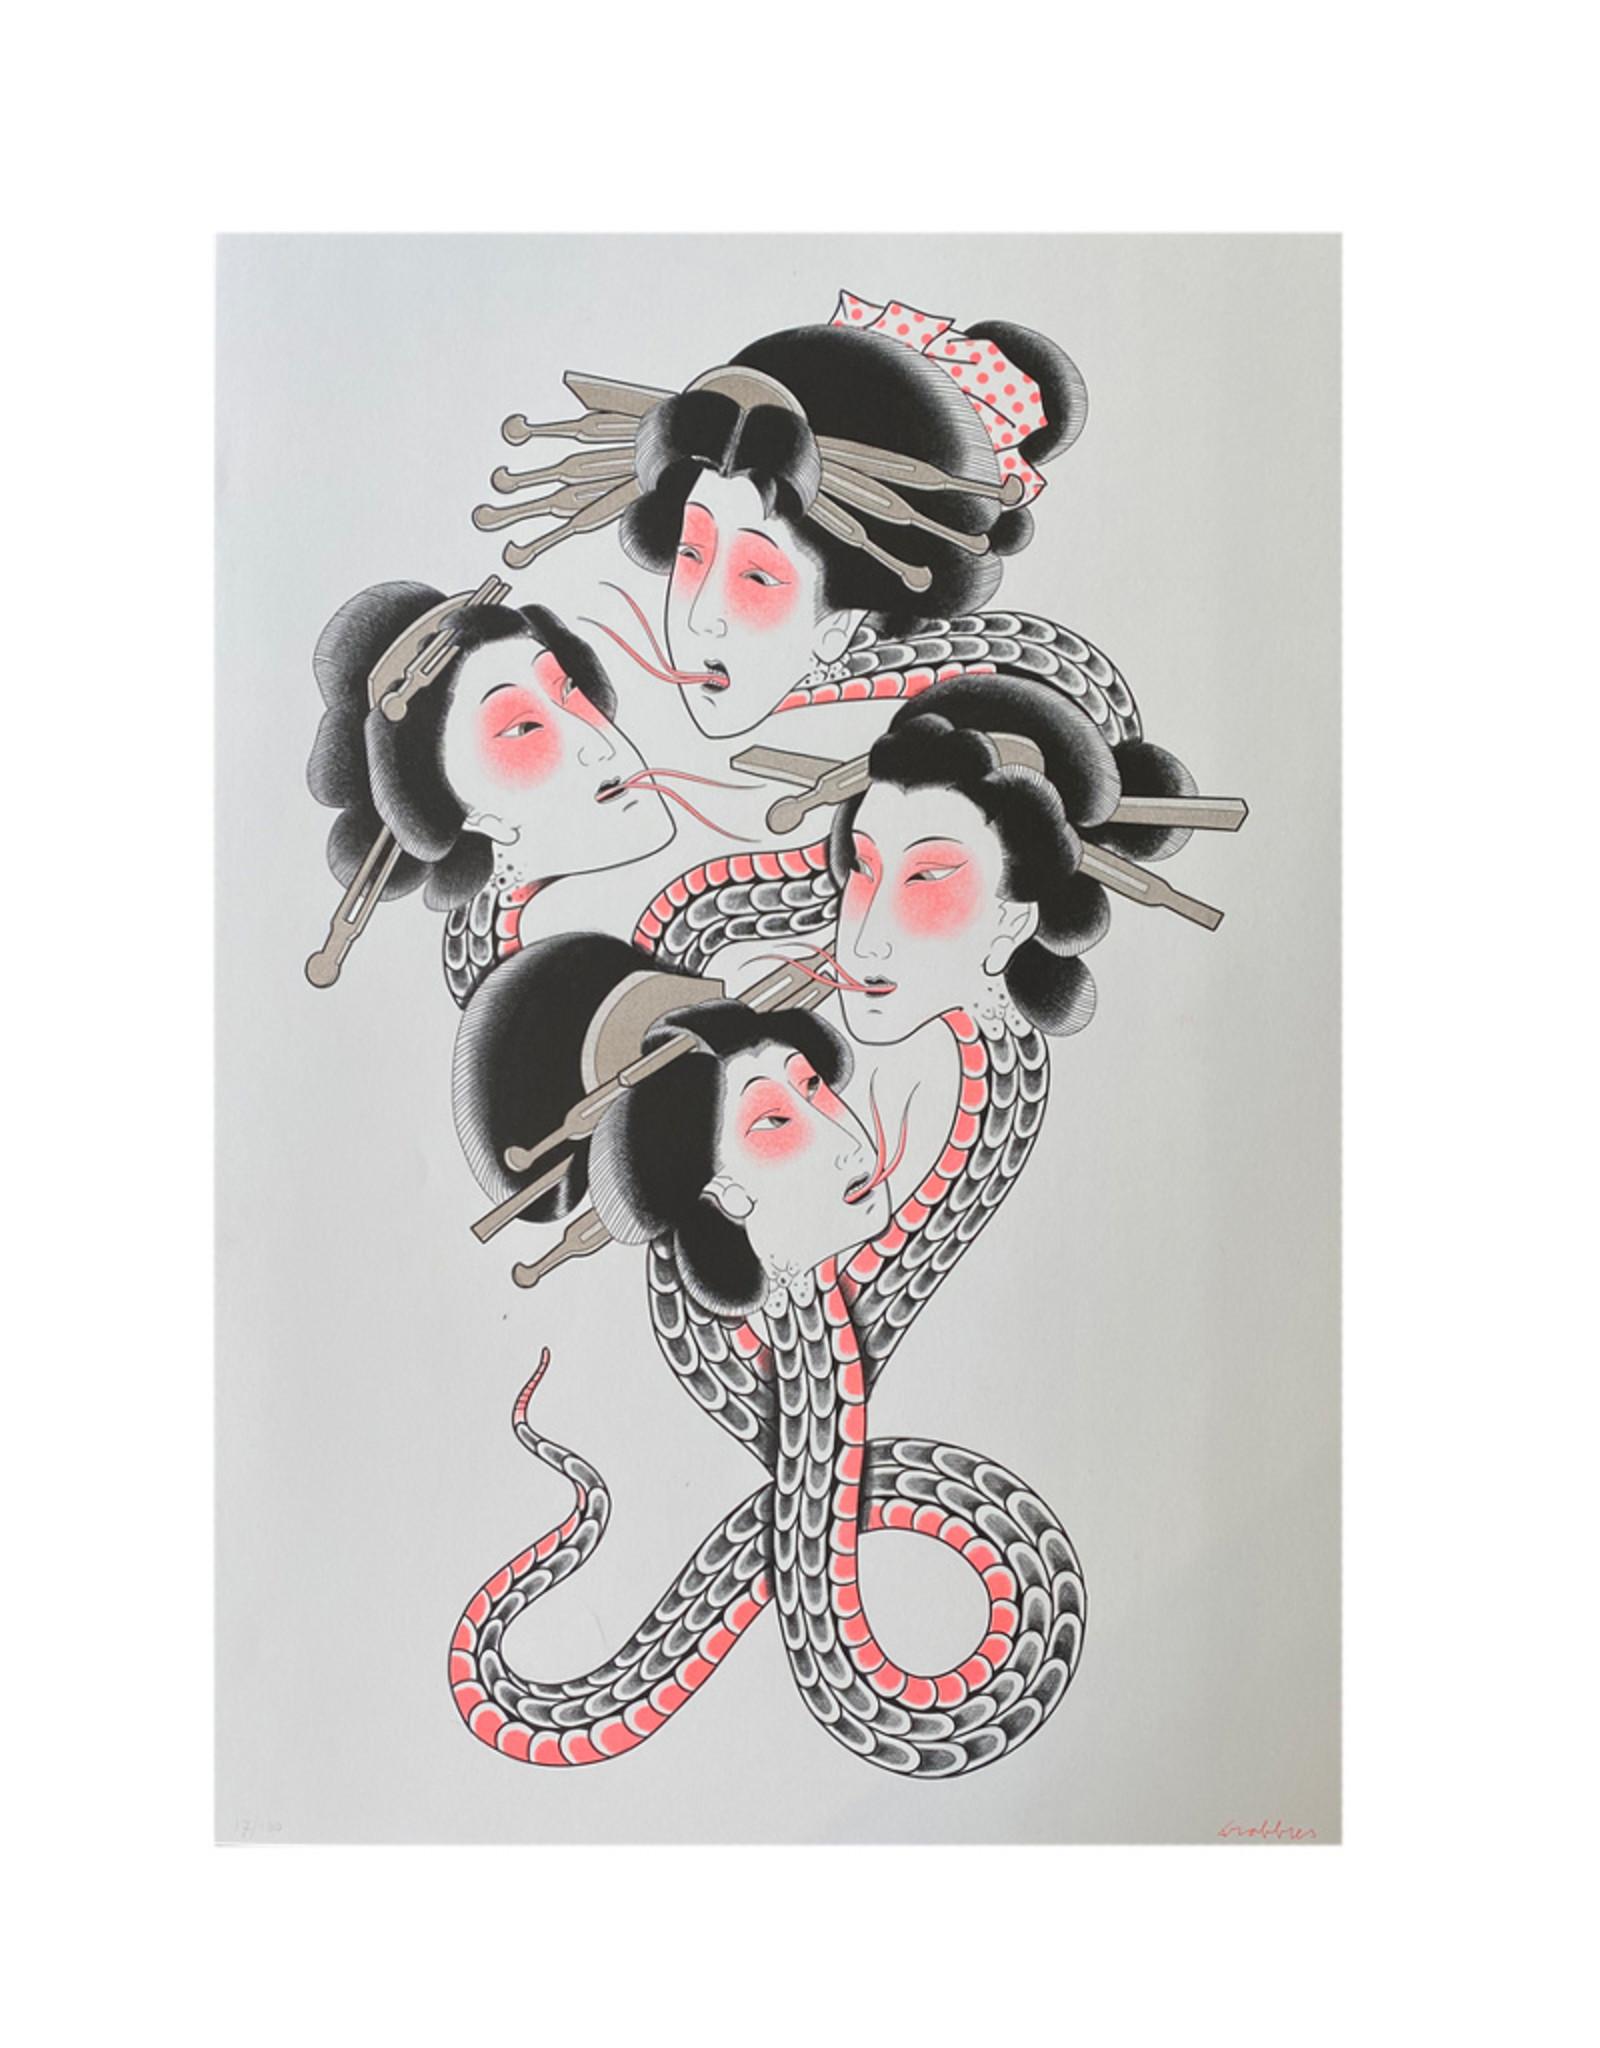 Trobbies Trobbies - Reversed Medusa, Riso Print